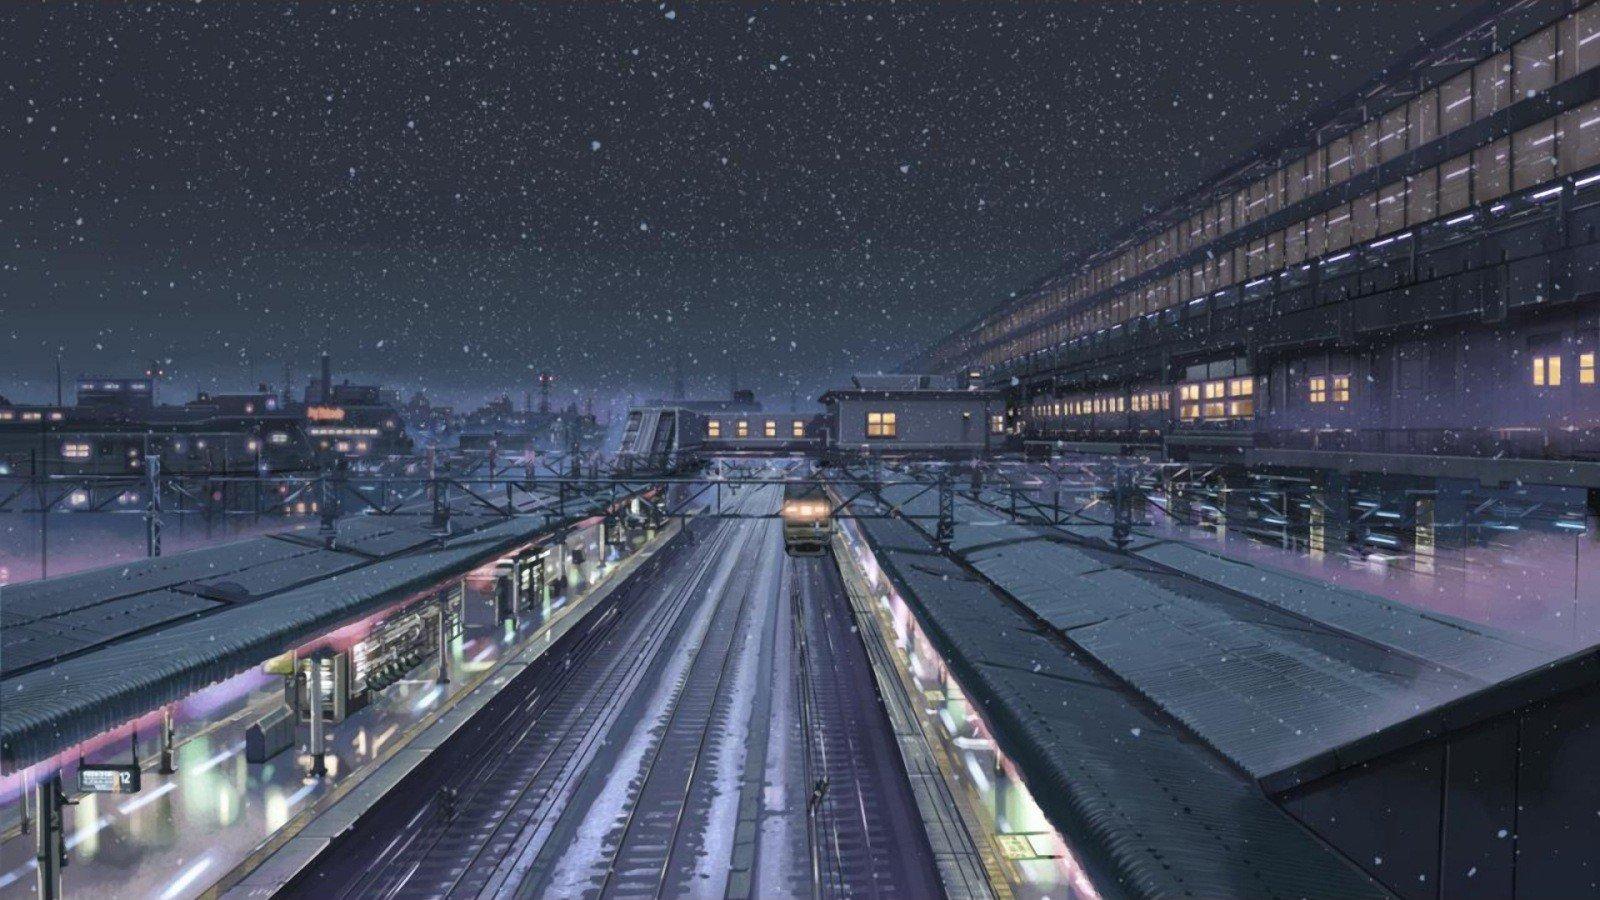 Wallpaper 1600x900 Px 5 Centimeters Per Second Makoto Shinkai Night Snow Train Station Winter 1600x900 Coolwallpapers 1513077 Hd Wallpapers Wallhere